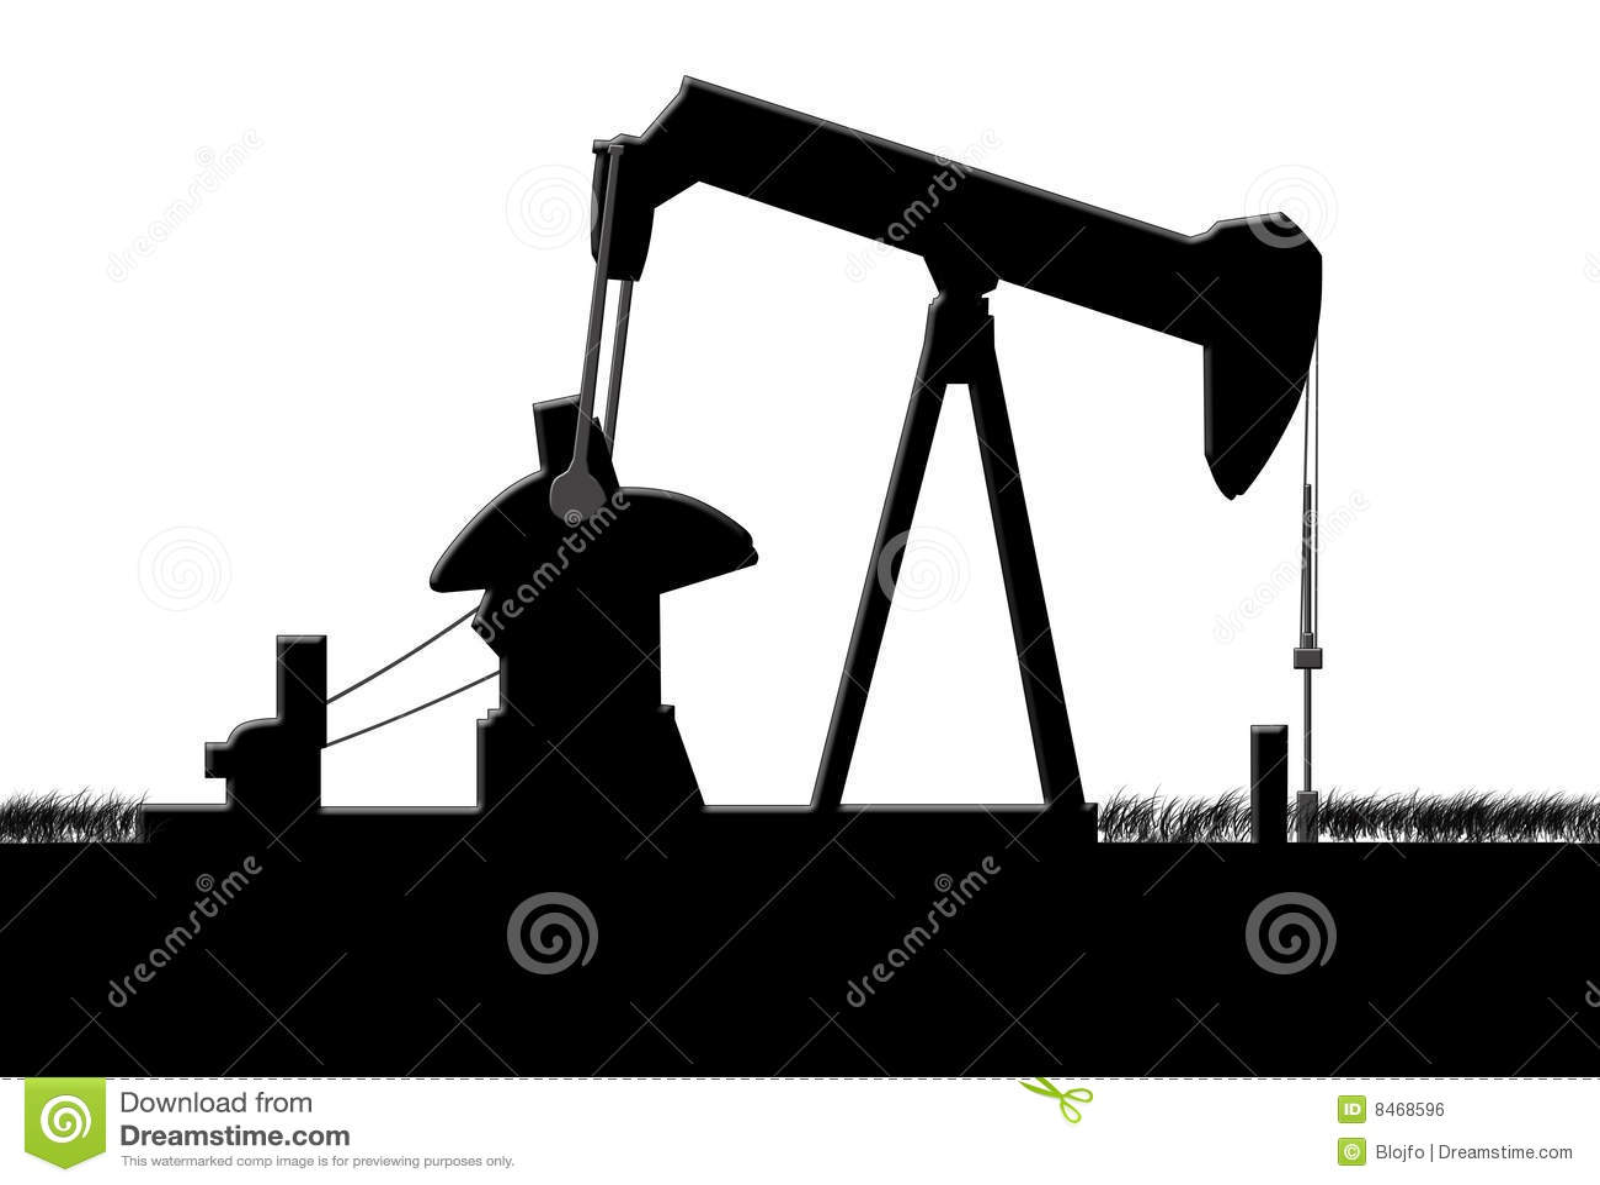 Oljepump